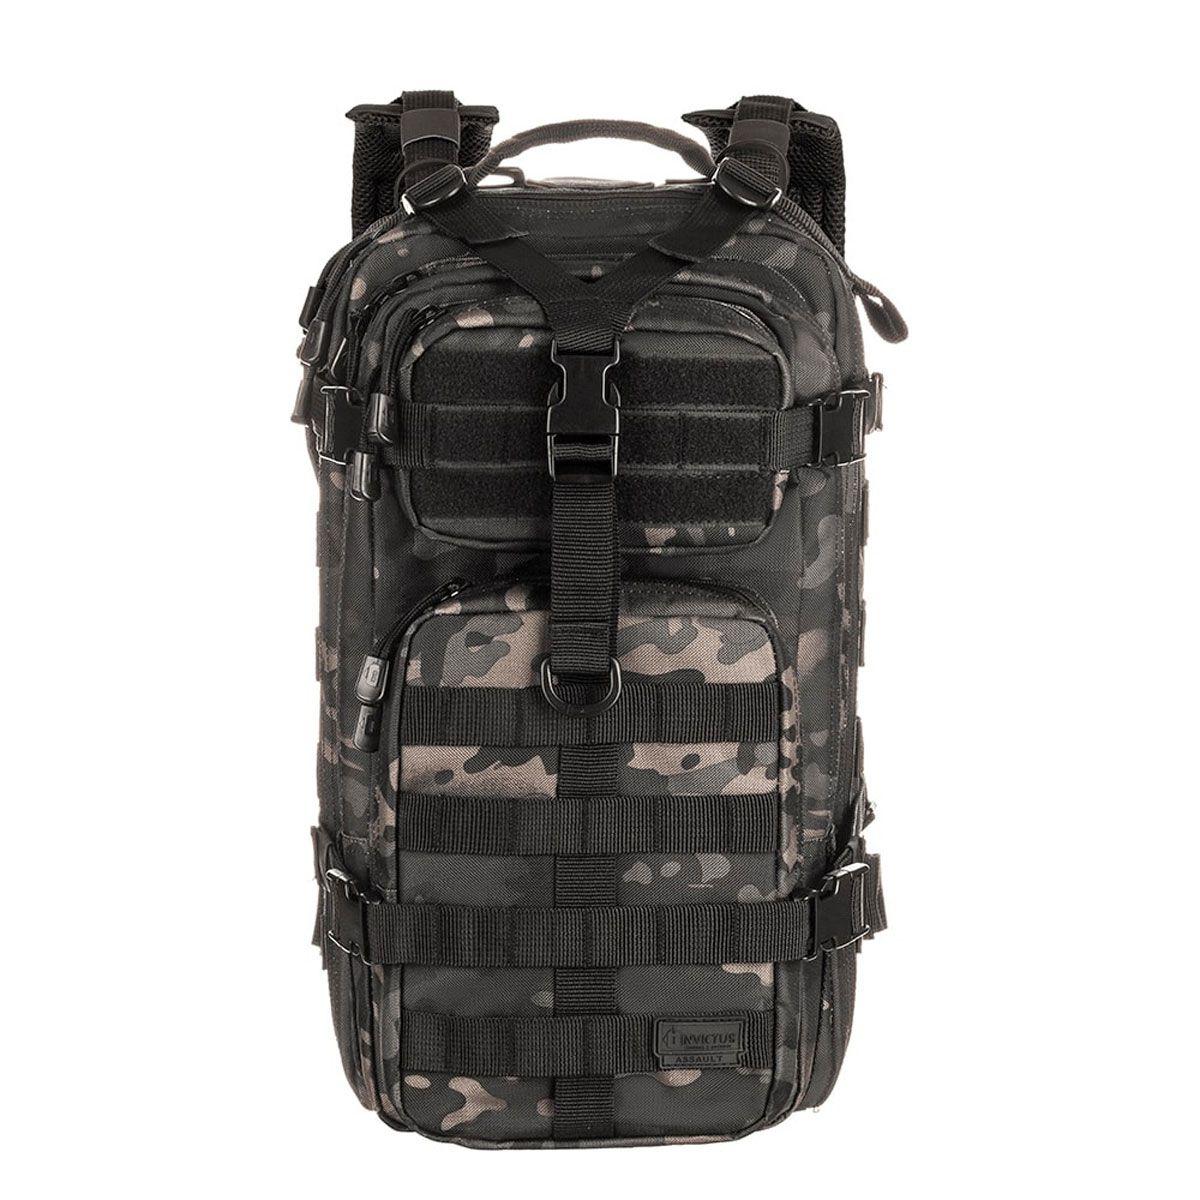 Mochila Militar Assault Camuflada Multicam Warskin Black